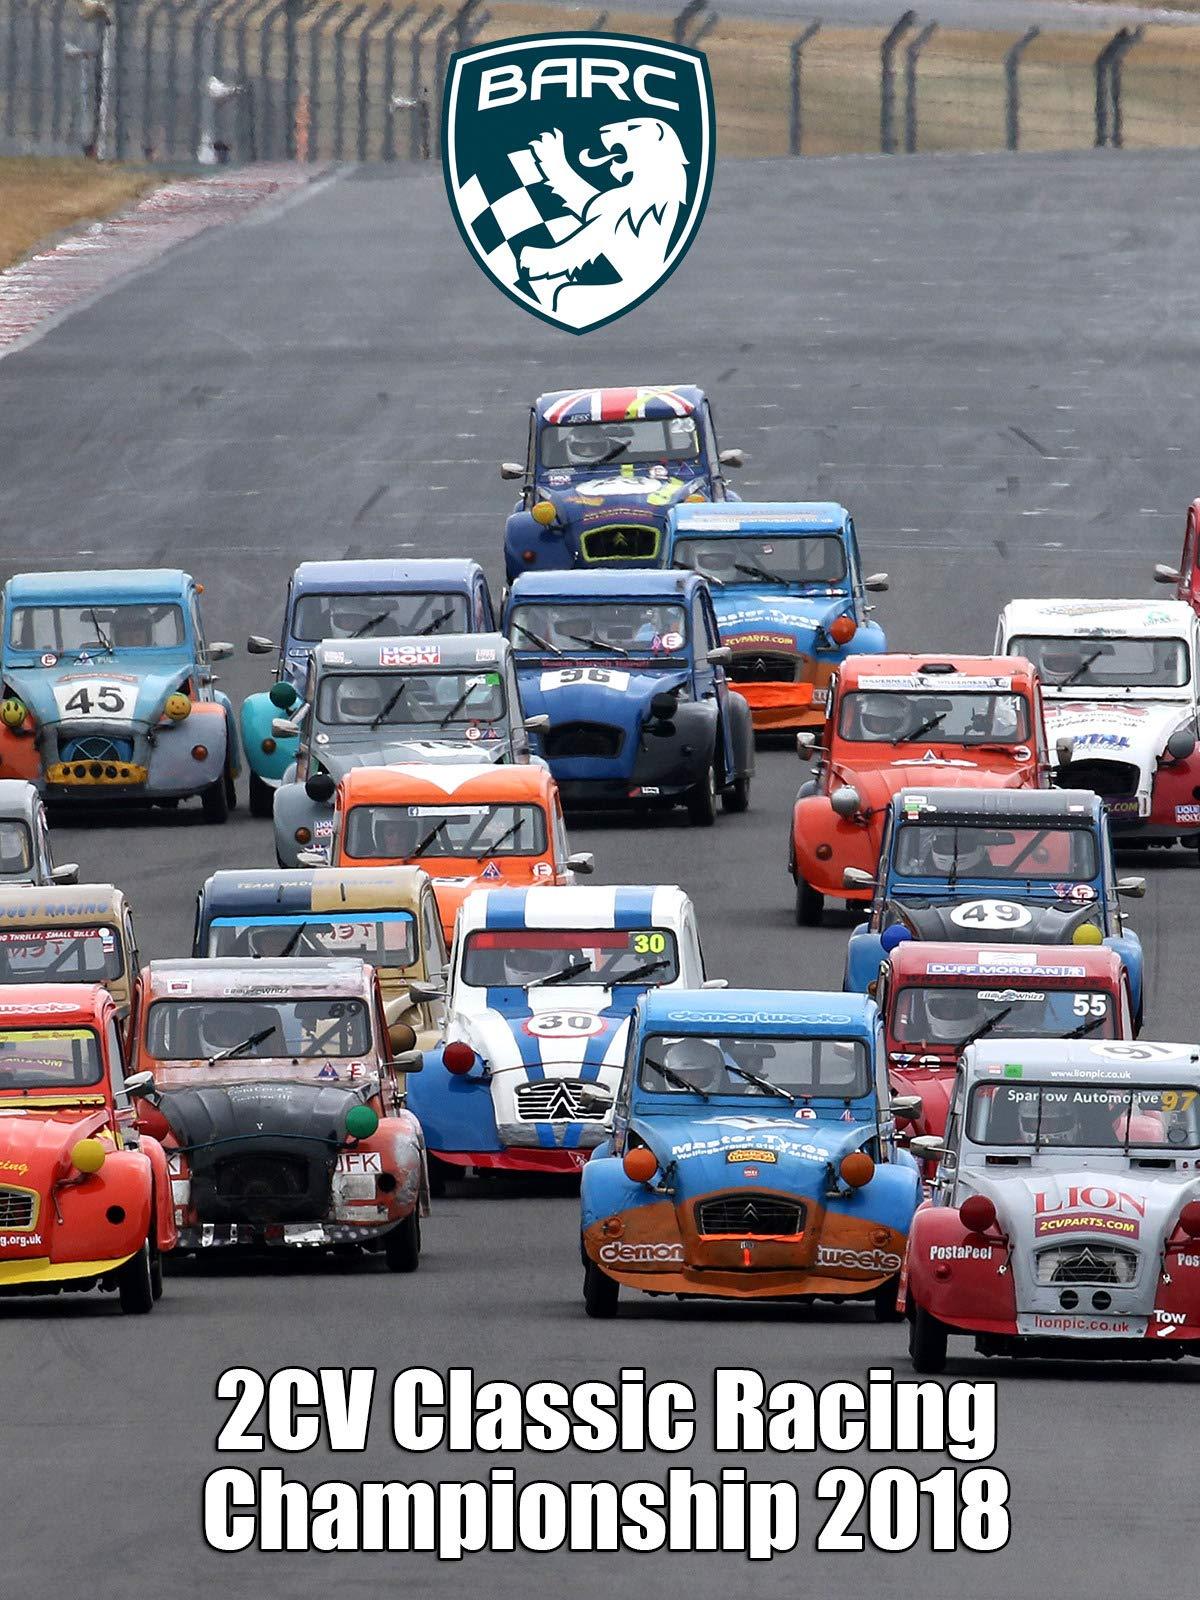 2CV Classic Racing Championship